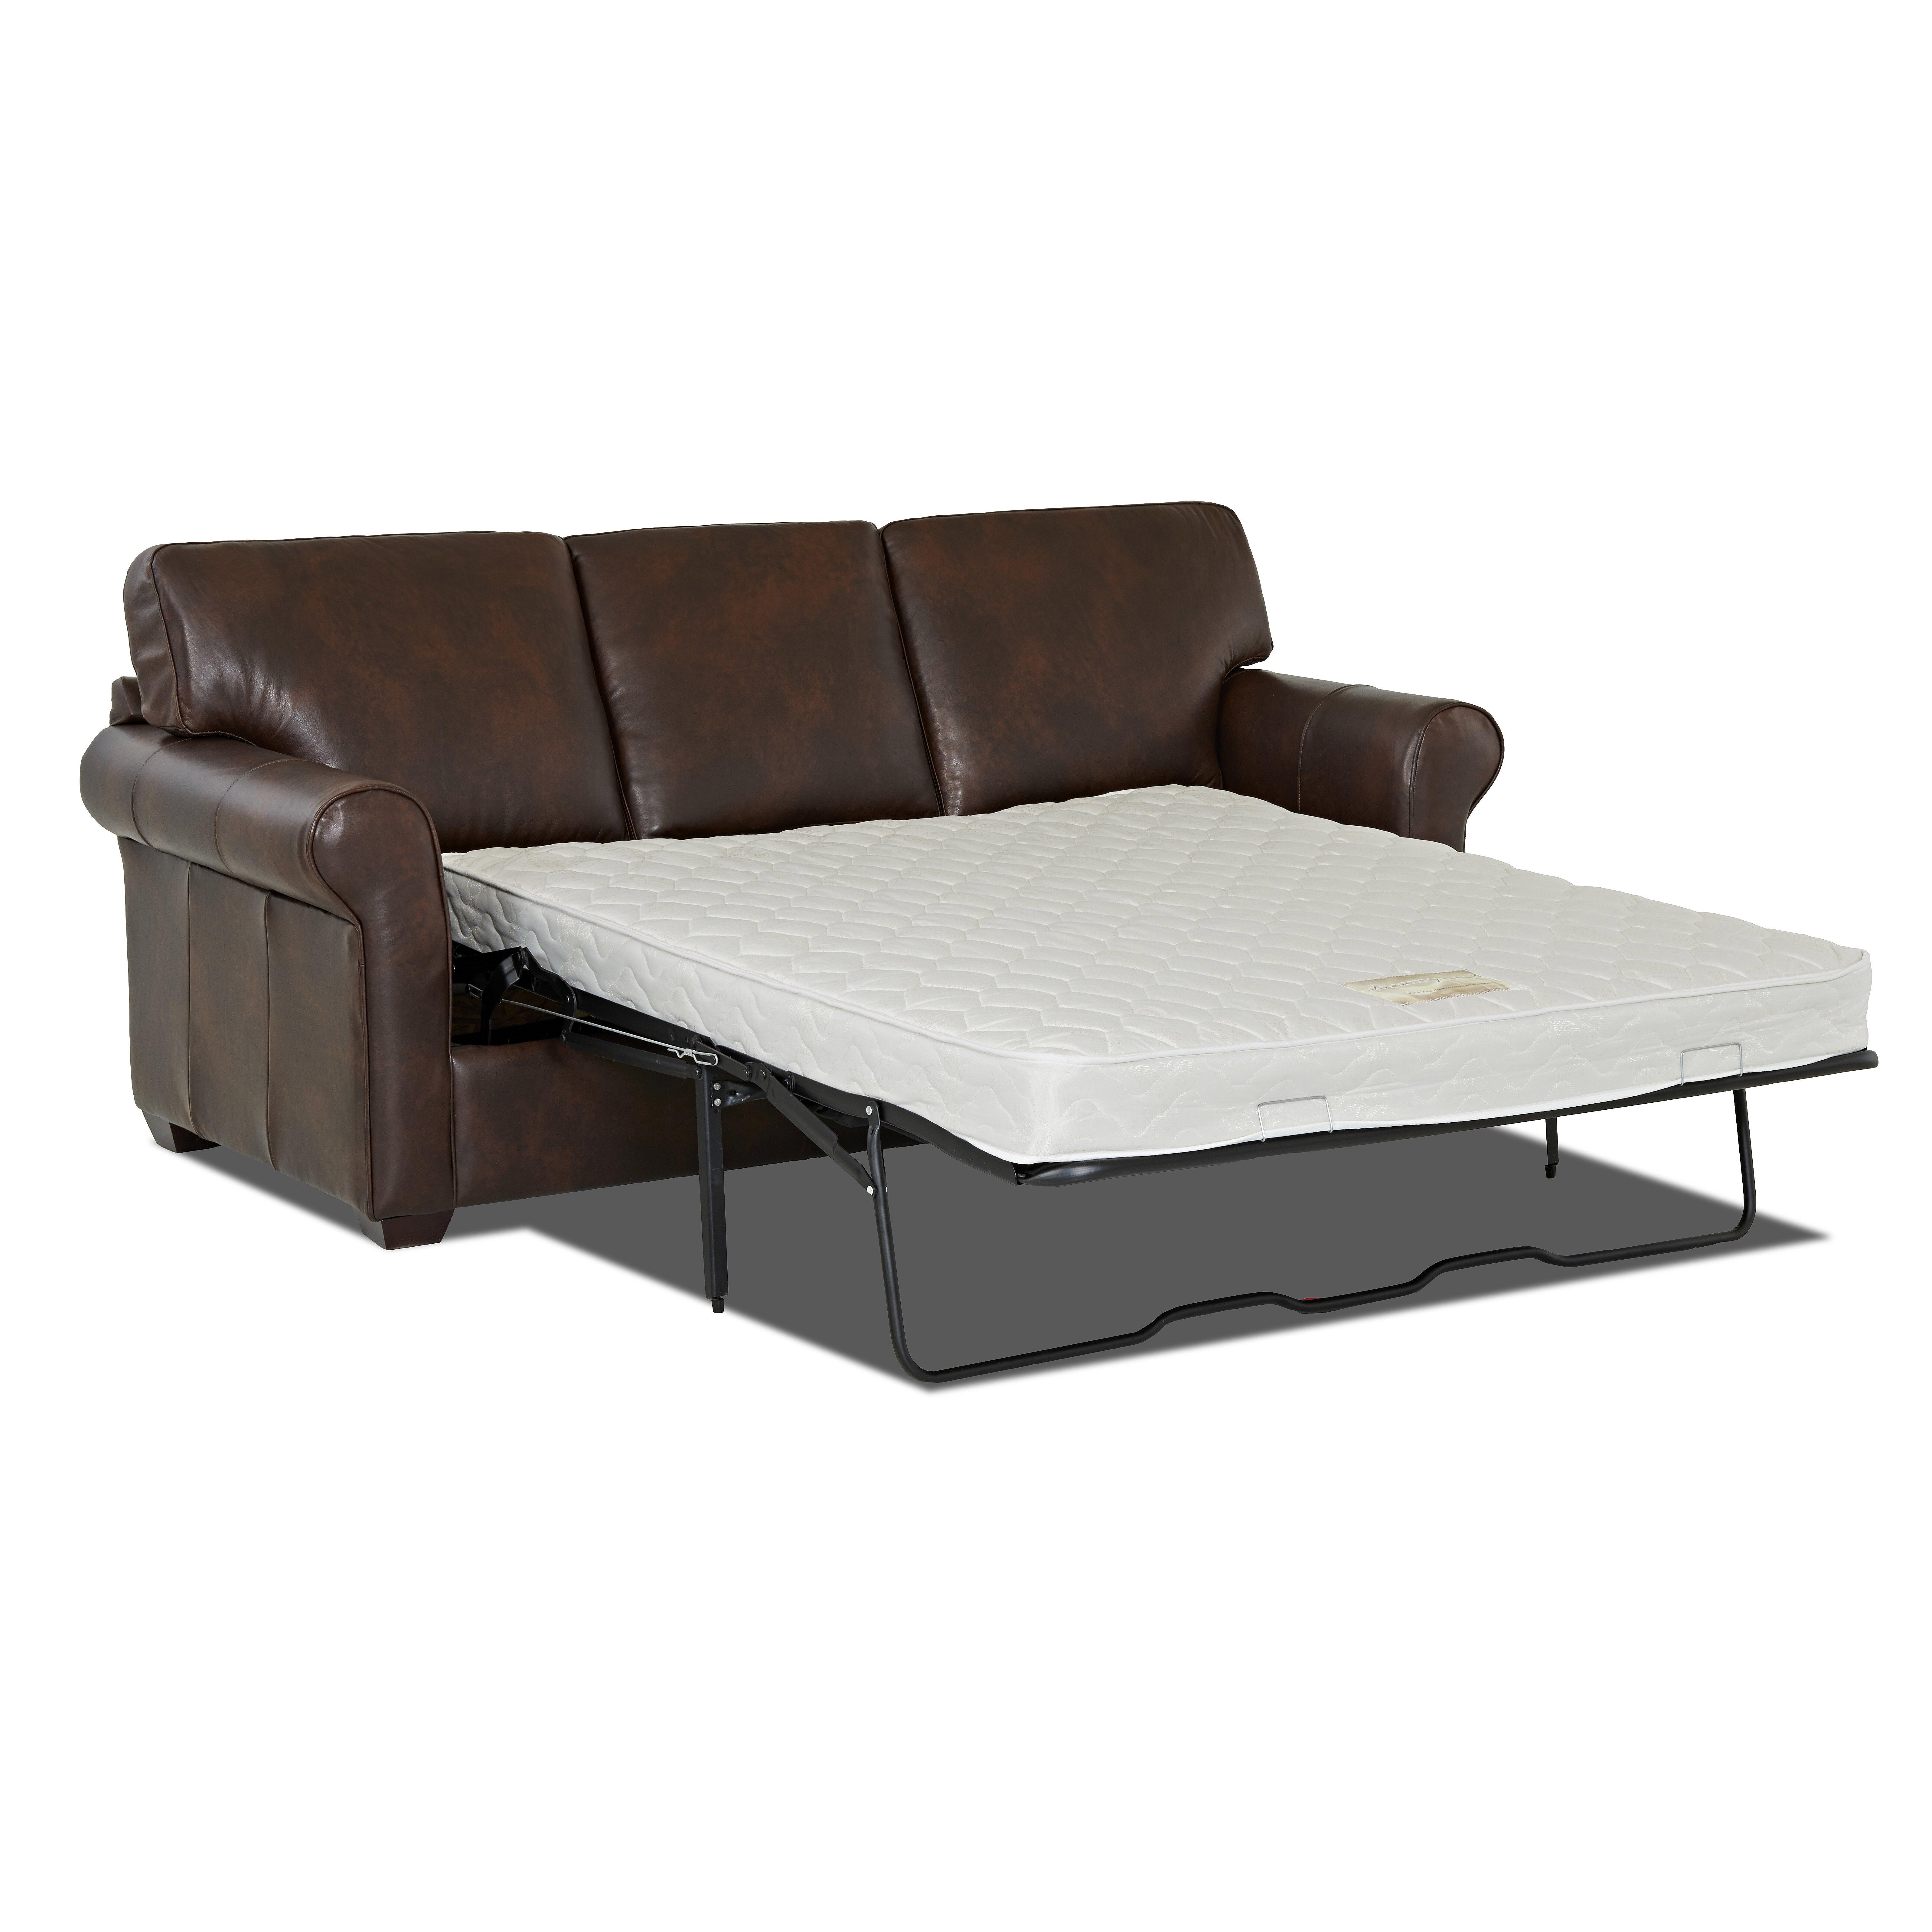 Wayfair Custom Upholstery Rachel Leather Sleeper Sofa